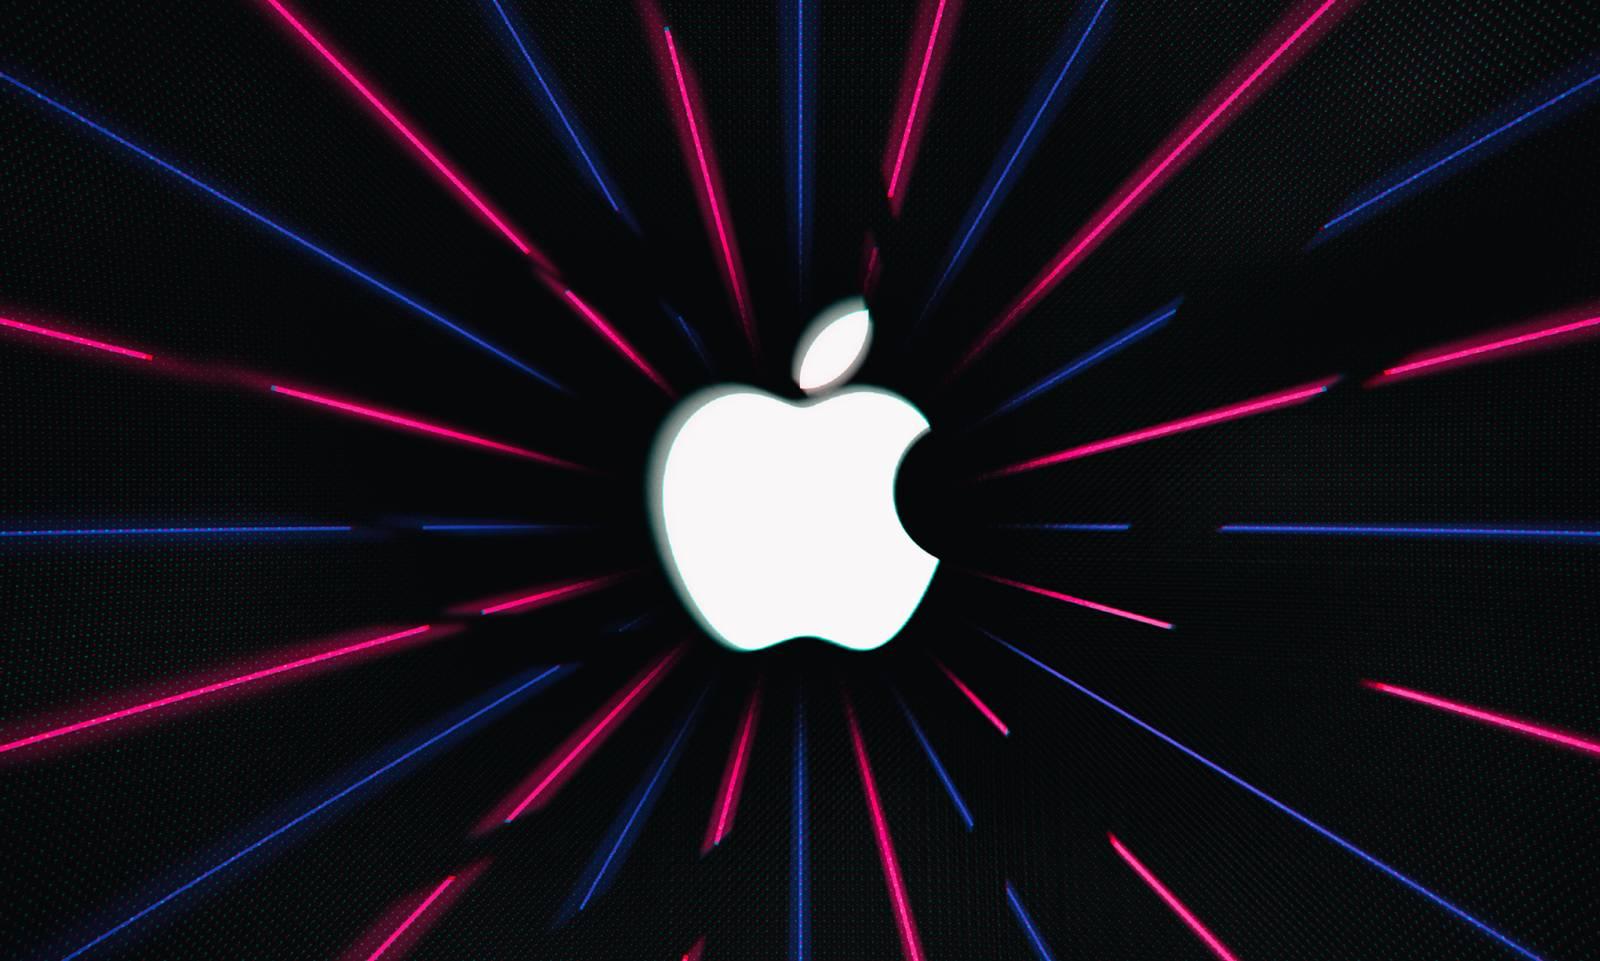 iphone 12 design interesant